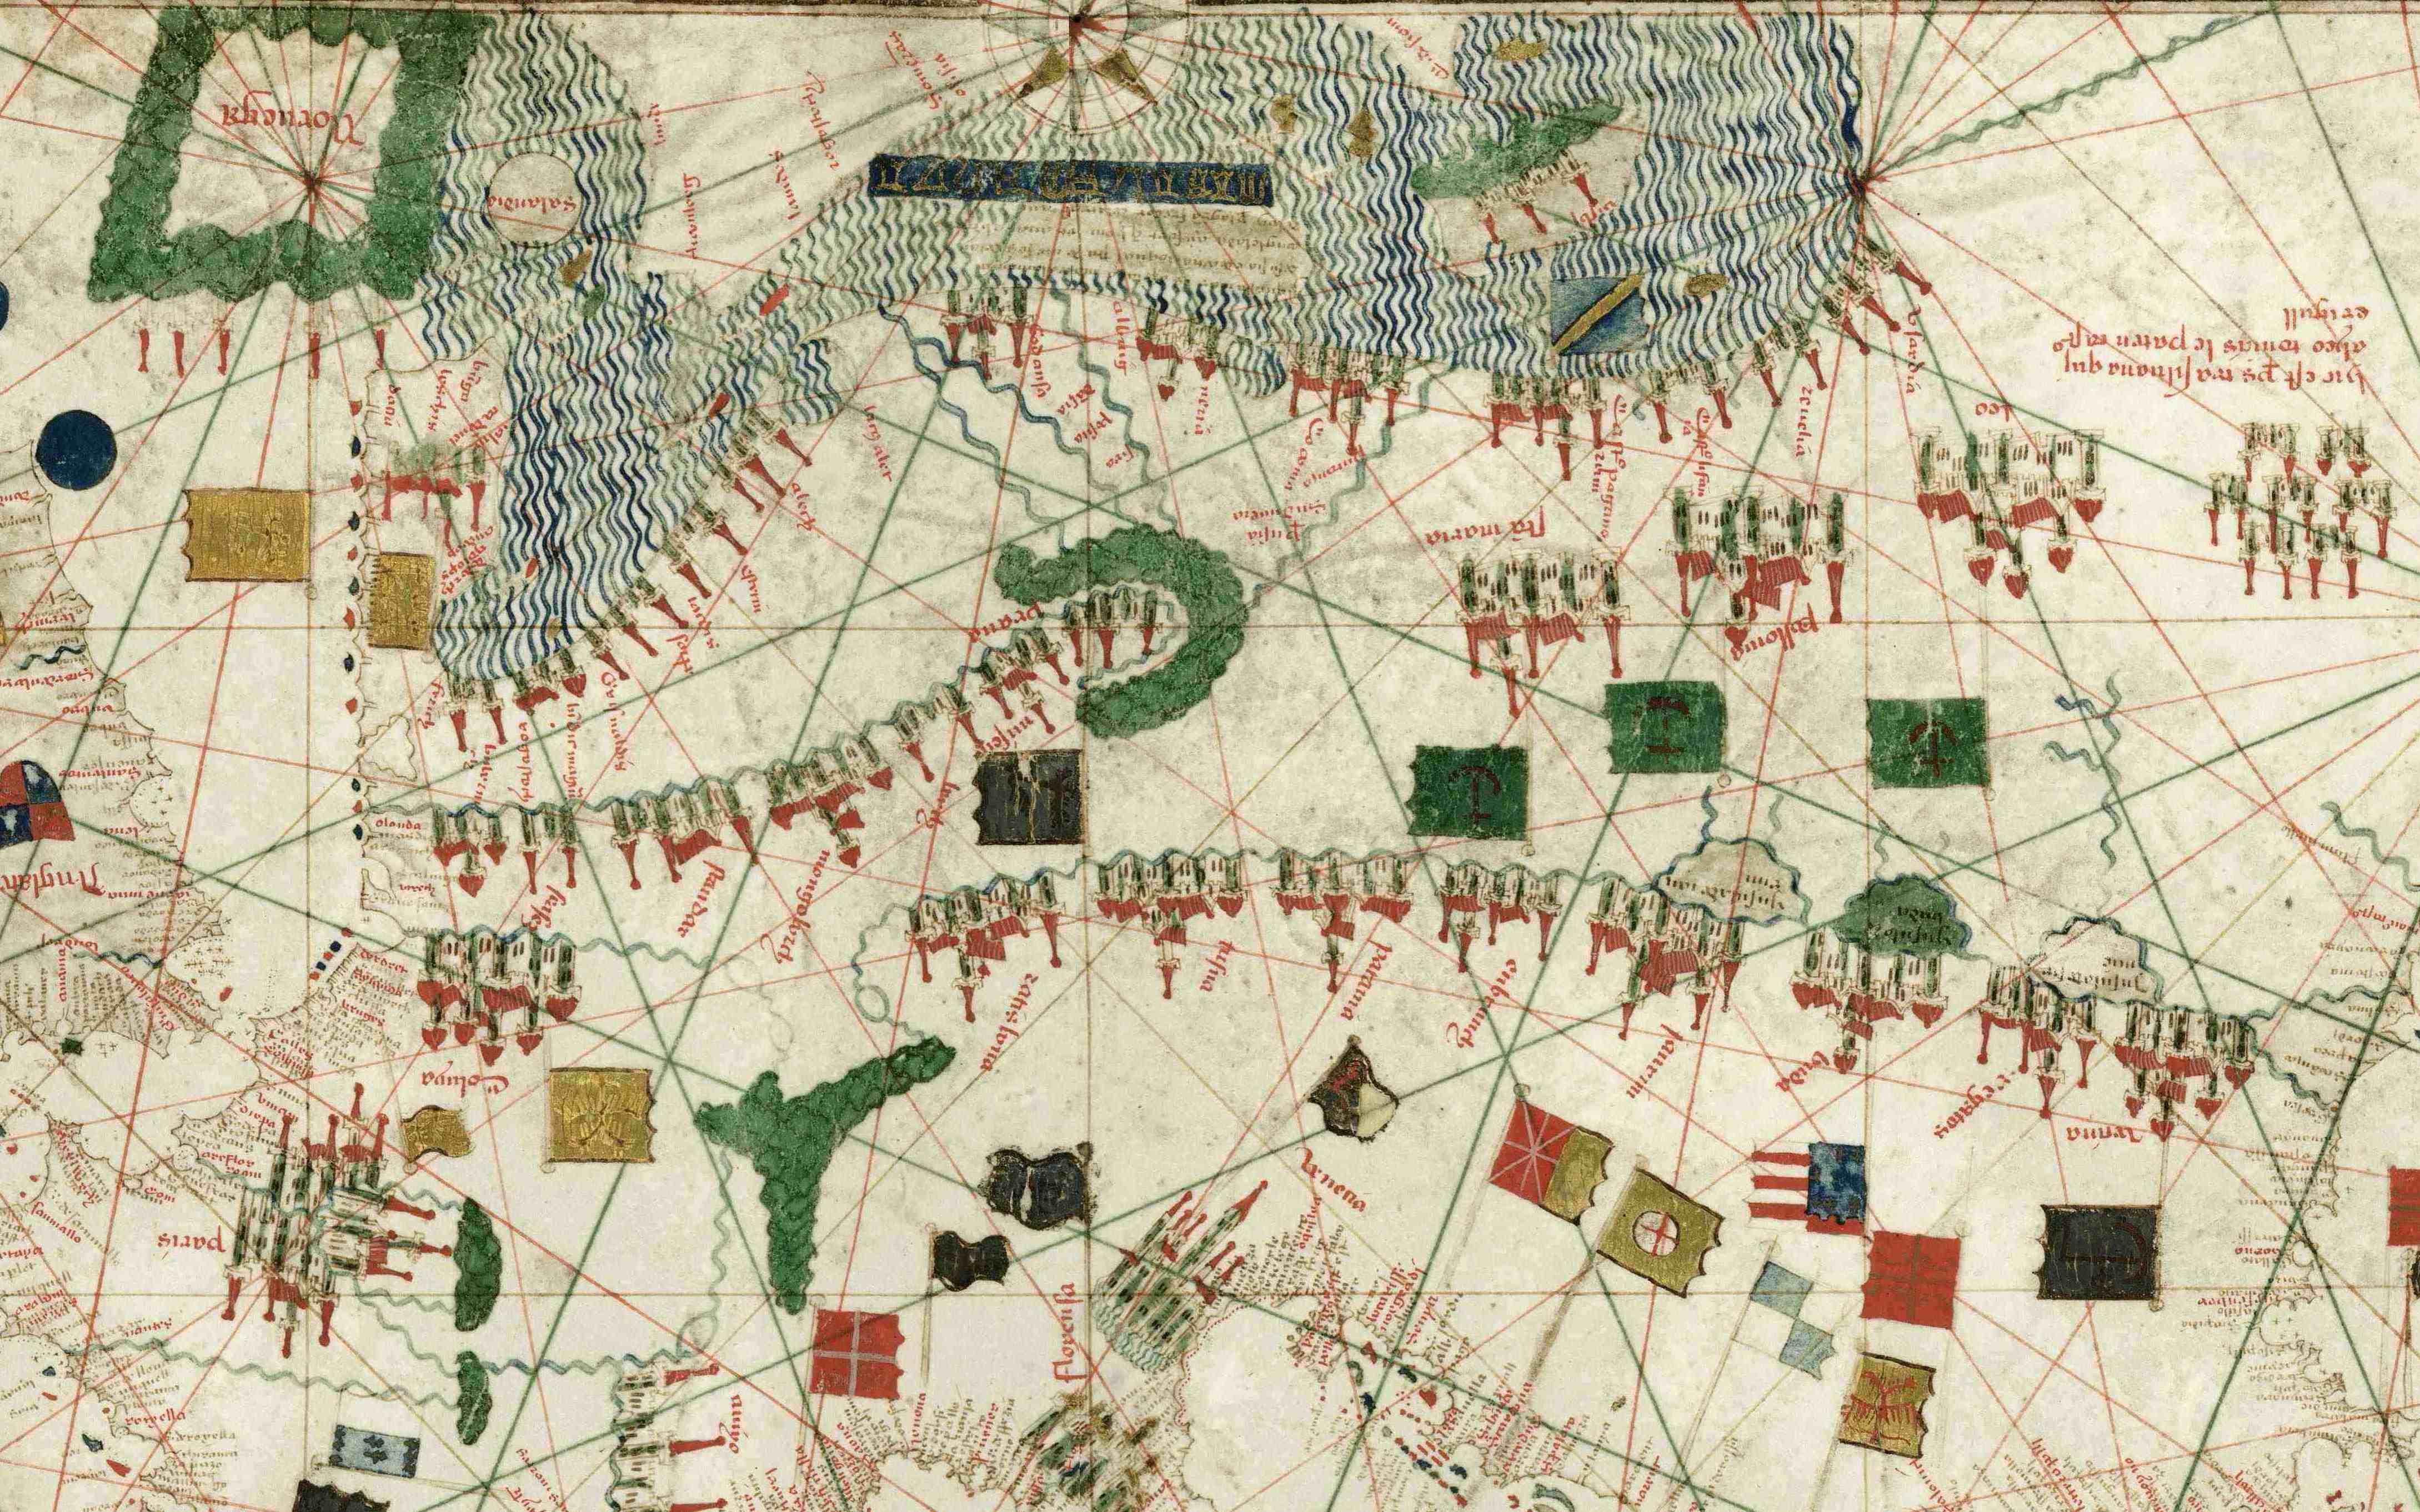 La Carta Náutica di Gabriel de Vallseca riprodotta da Lumenartis in 950 copie numerate.